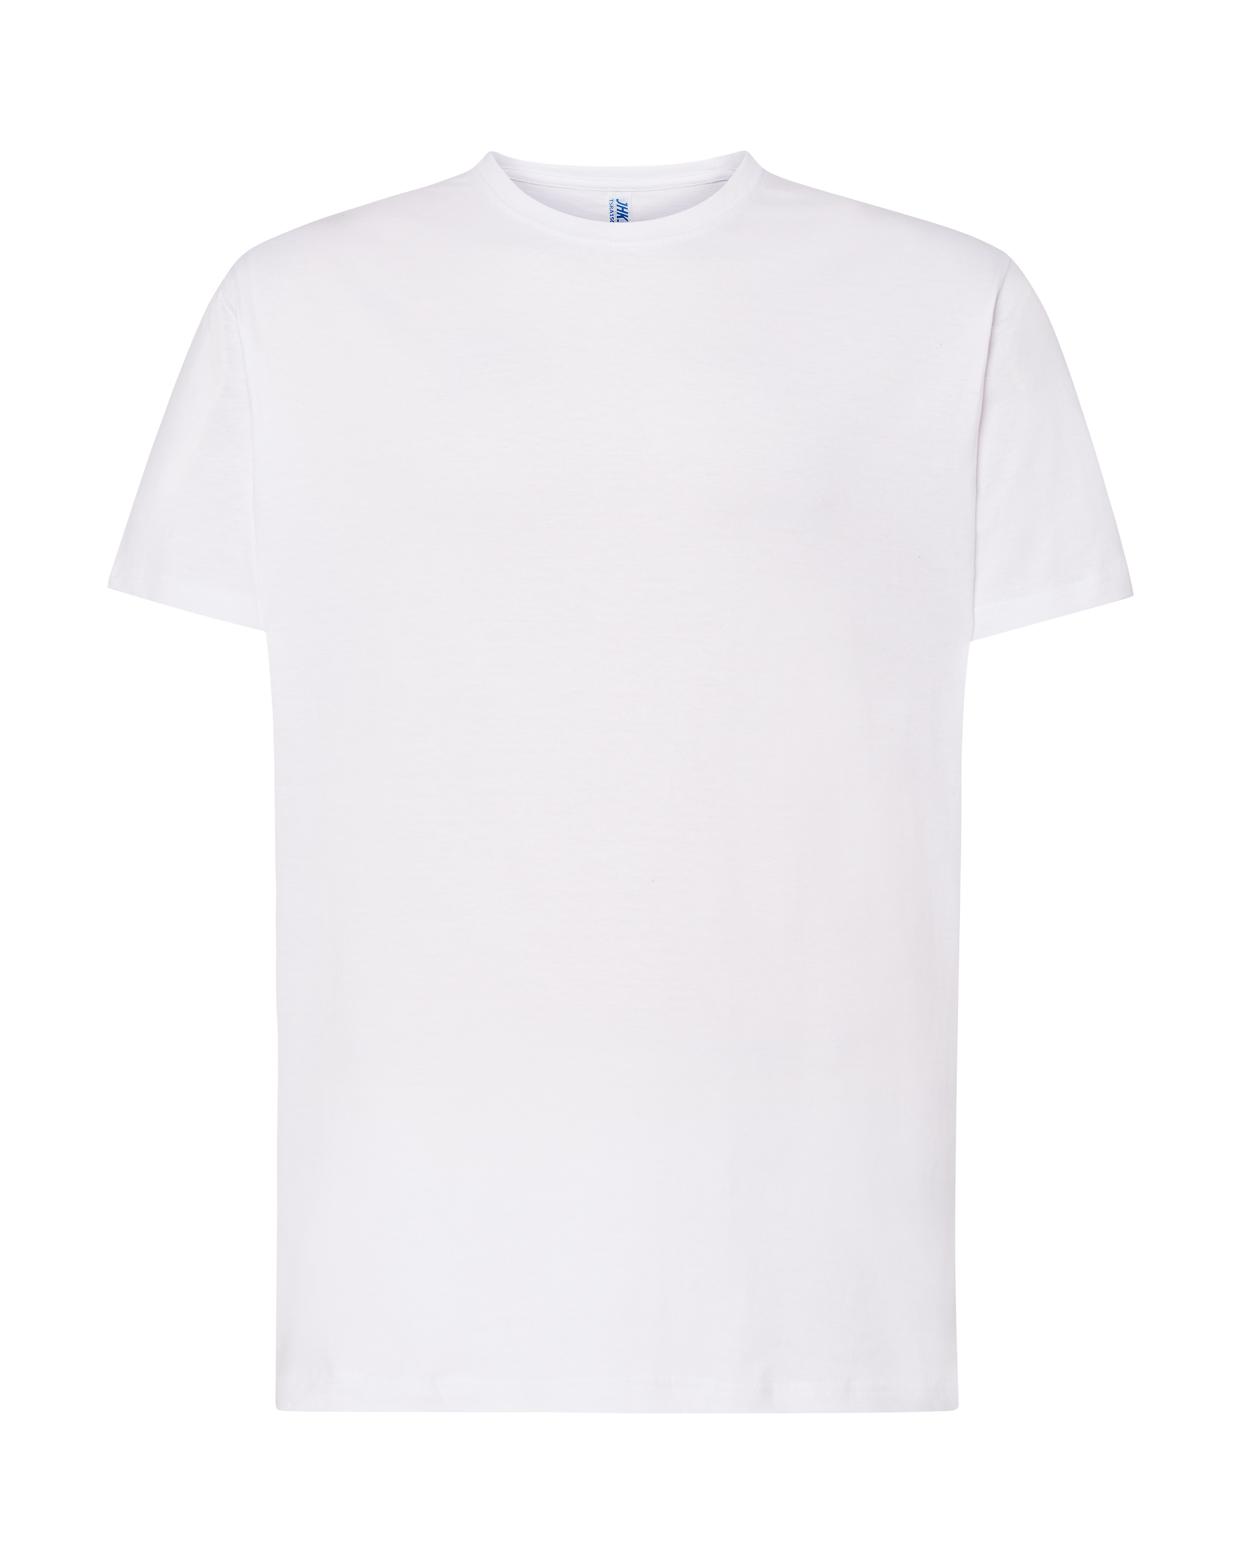 ShirtRegular Mantsra150 ShirtRegular Jhk Mantsra150 Jhk Jhk T T 3qc54LARj